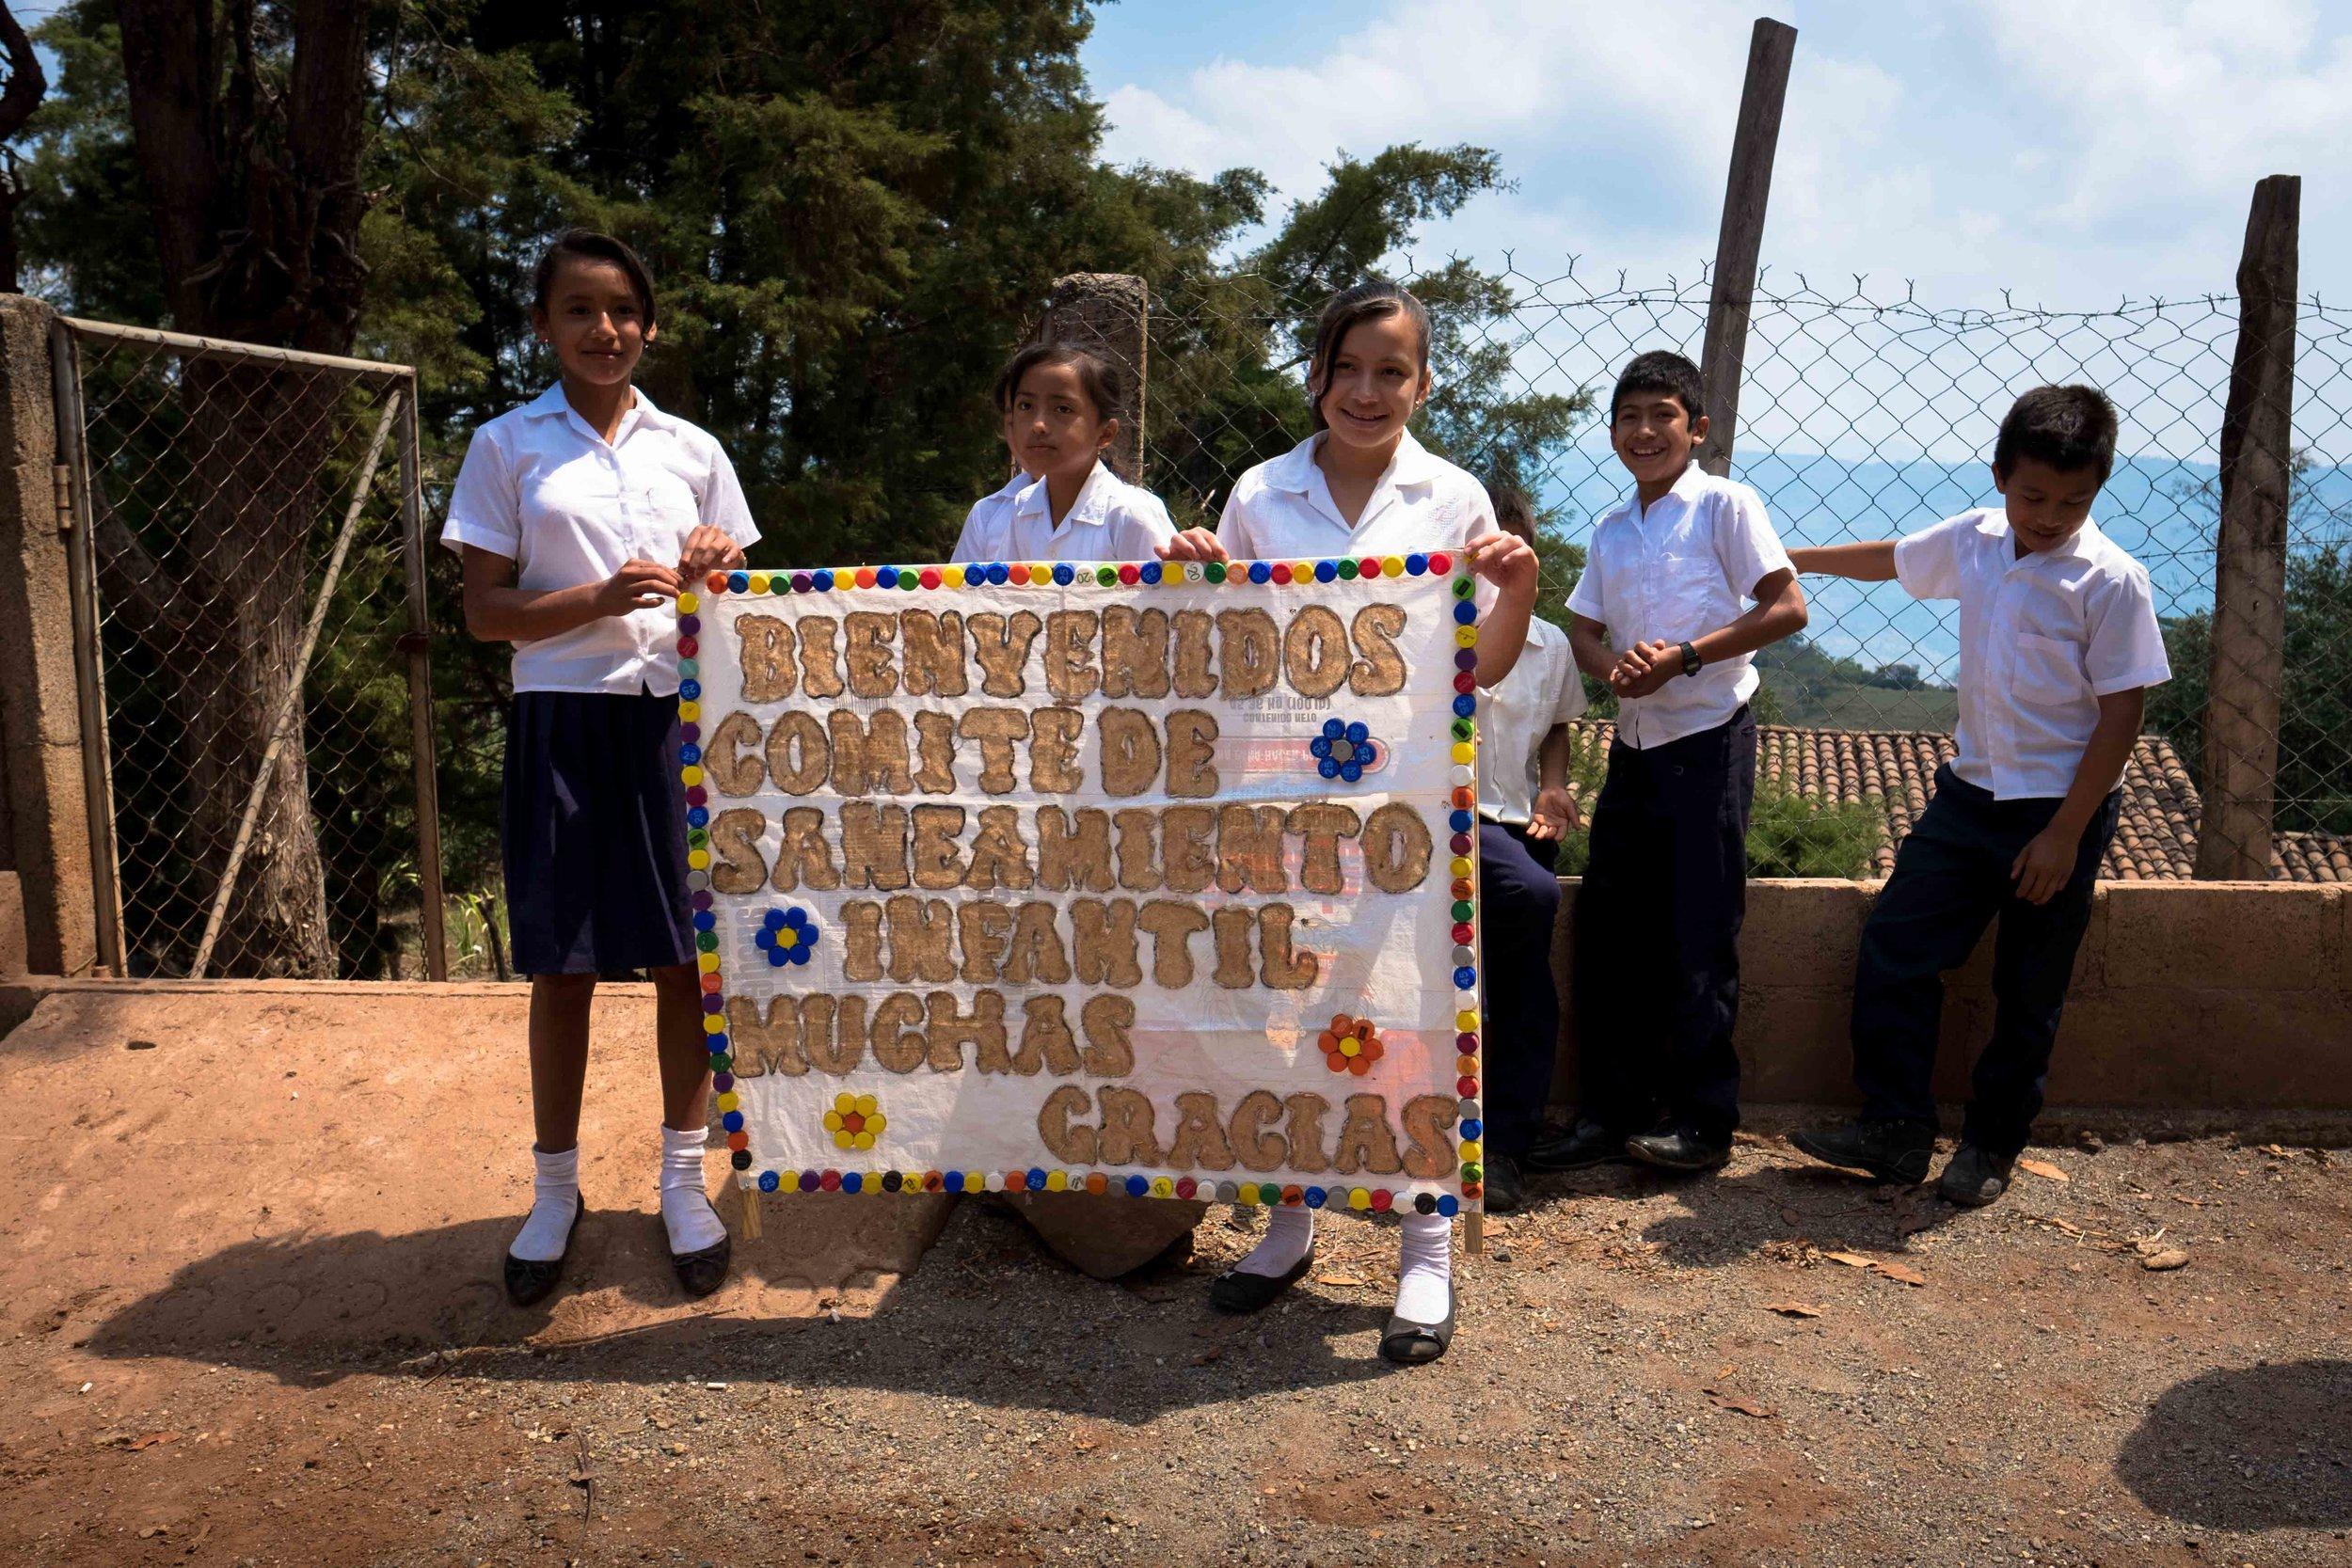 Honduras 18 day 2 welcome sign.jpg